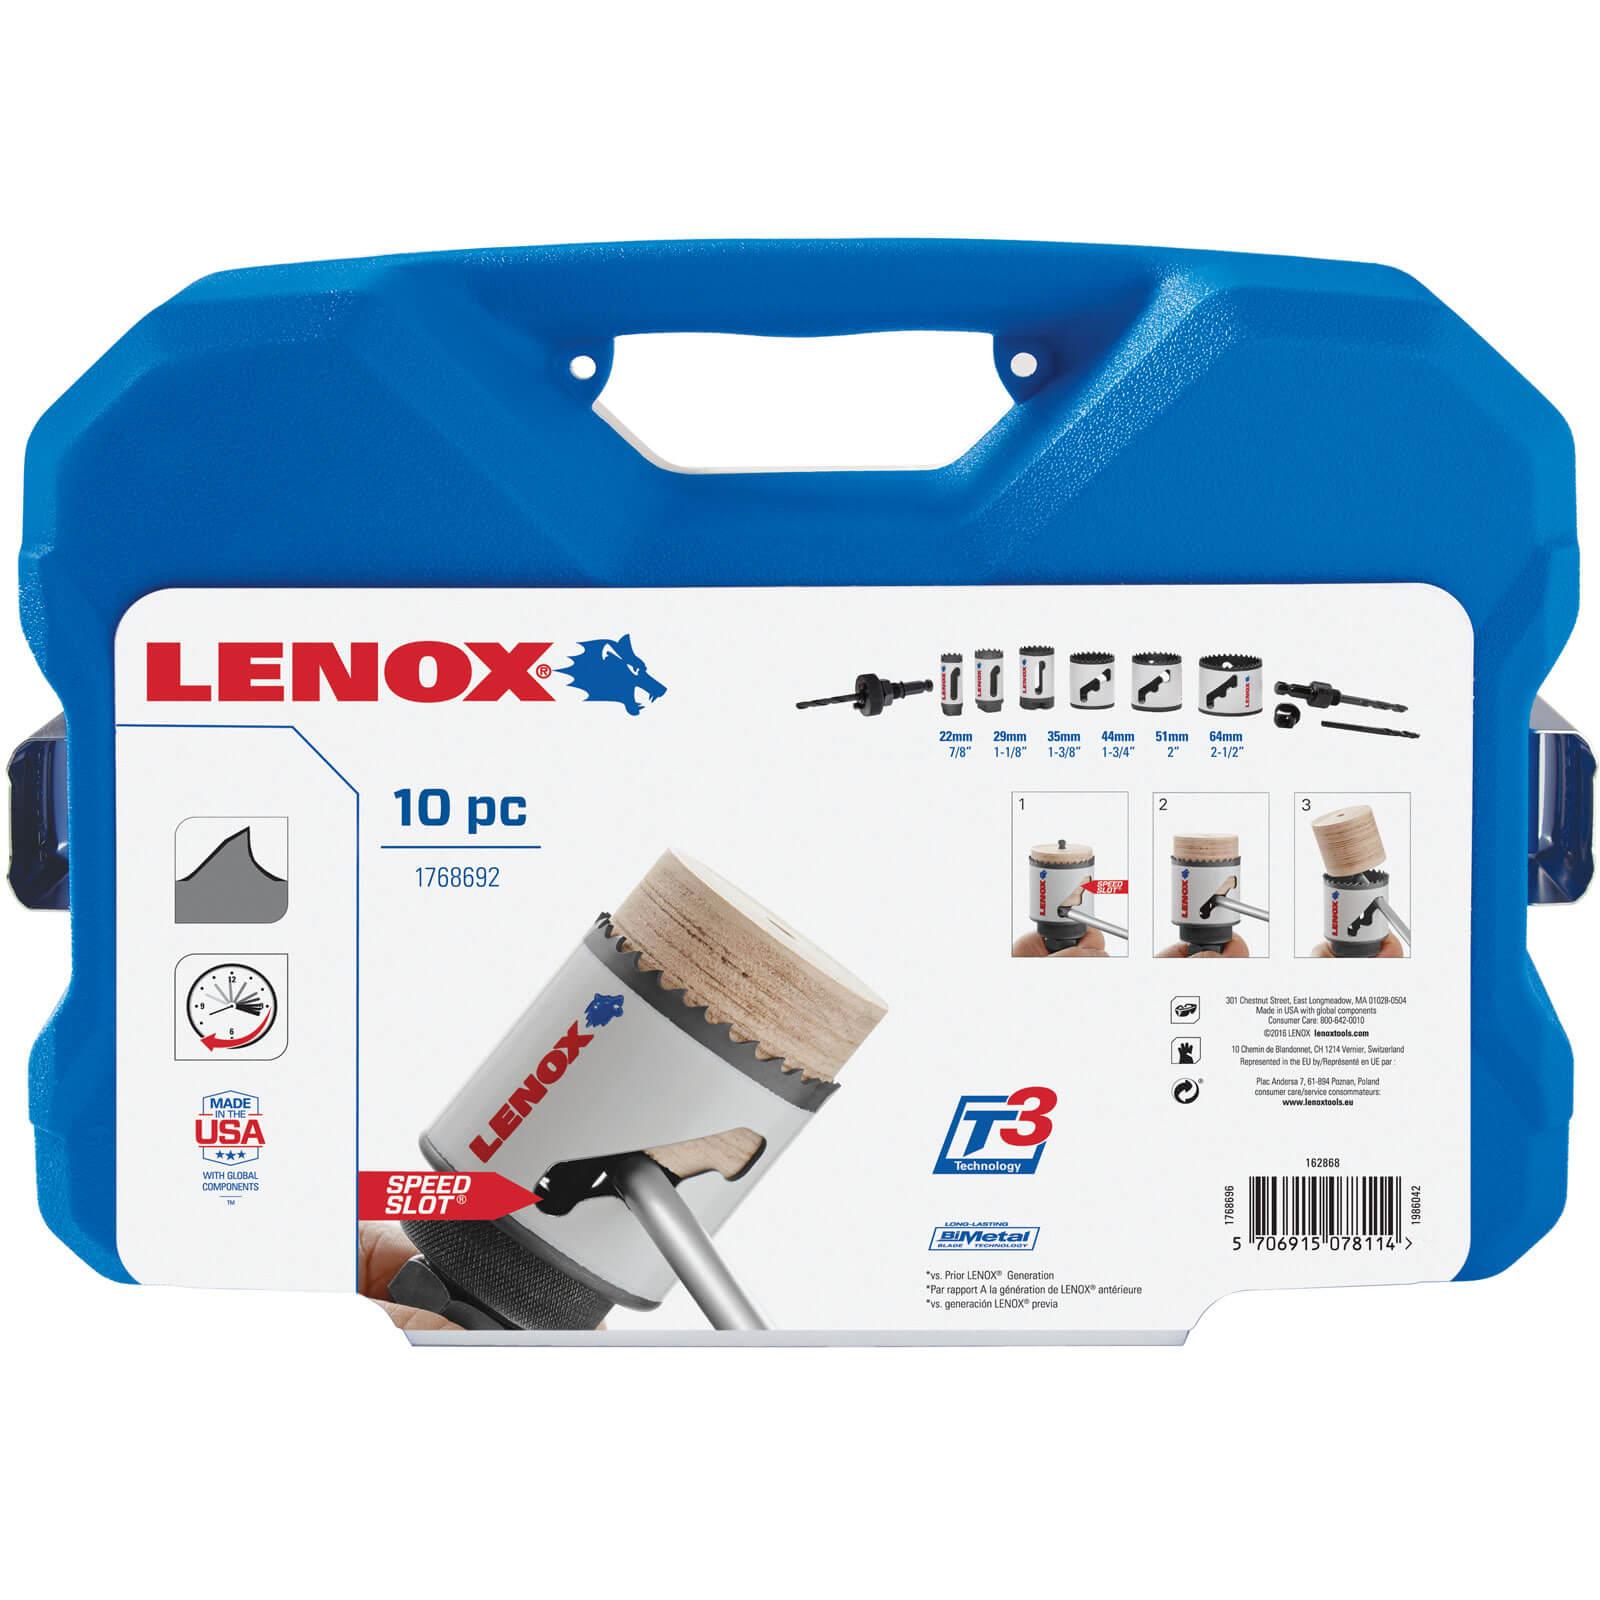 Image of Lenox 10 Piece Electricians Hole Saw Set